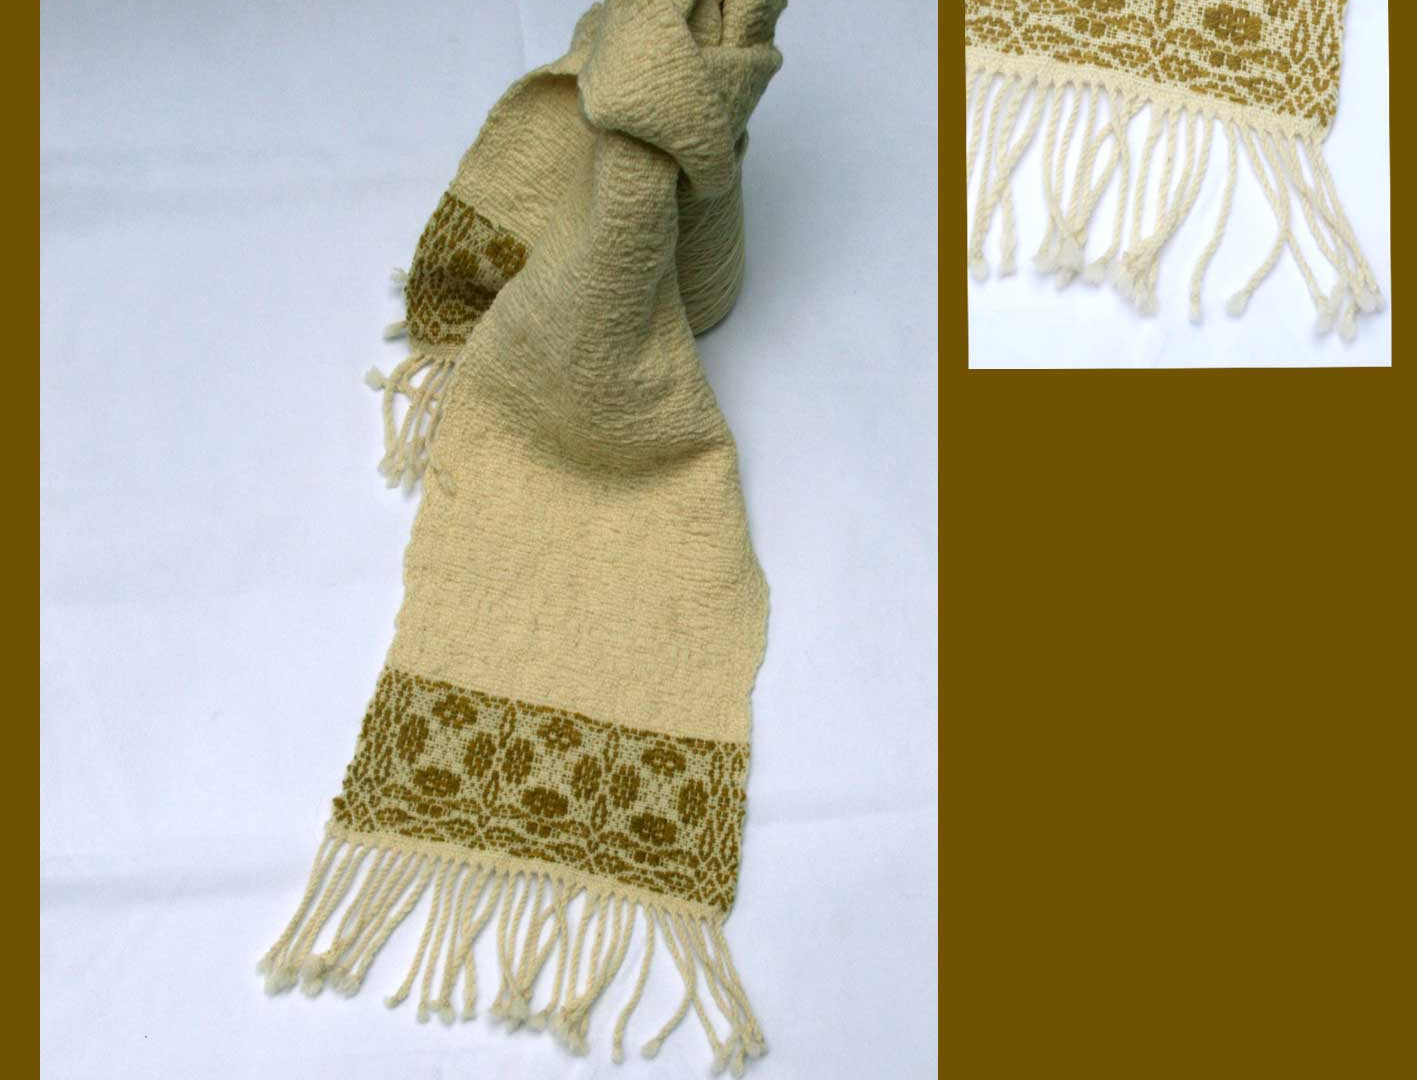 Echarpe laines bretonnes